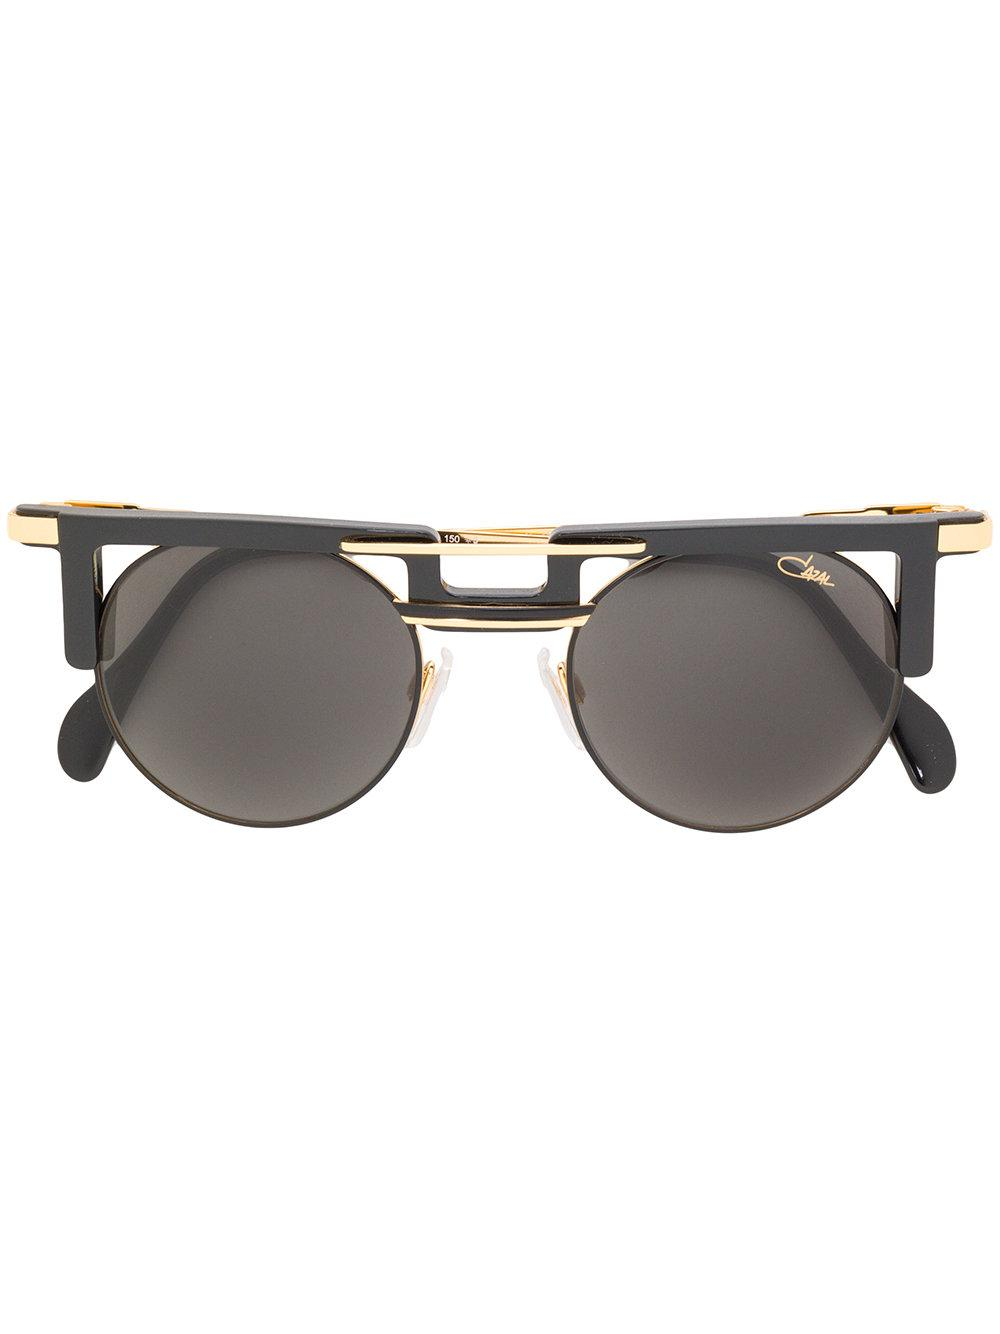 9801ff61d5b Cazal Double Nose Bridge Sunglasses - Black. Farfetch